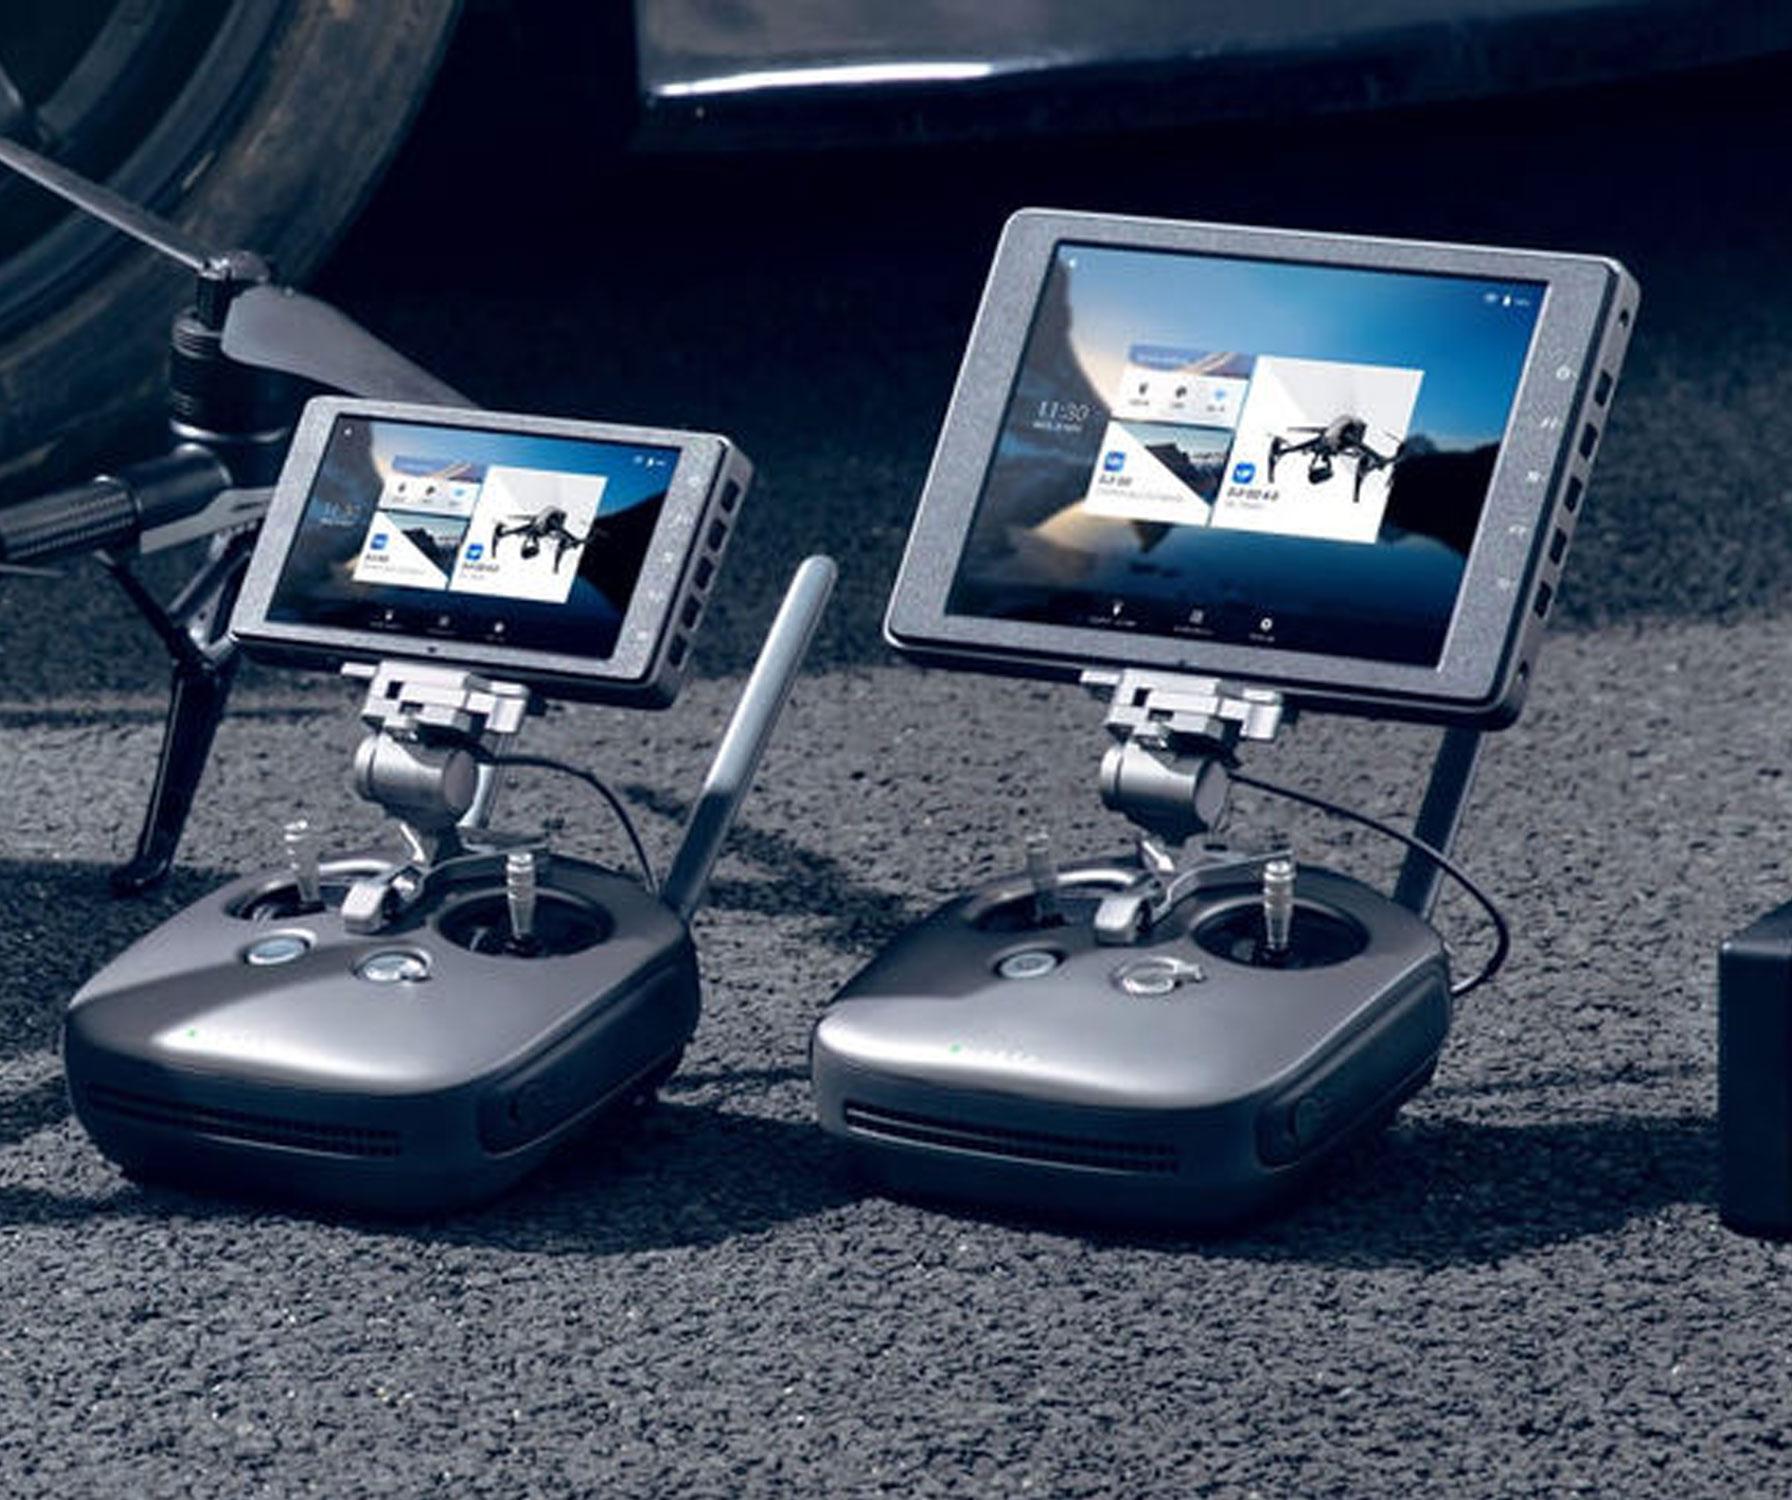 Dji Crystalsky Monitor 5 5 Quot High Brightness Innovative